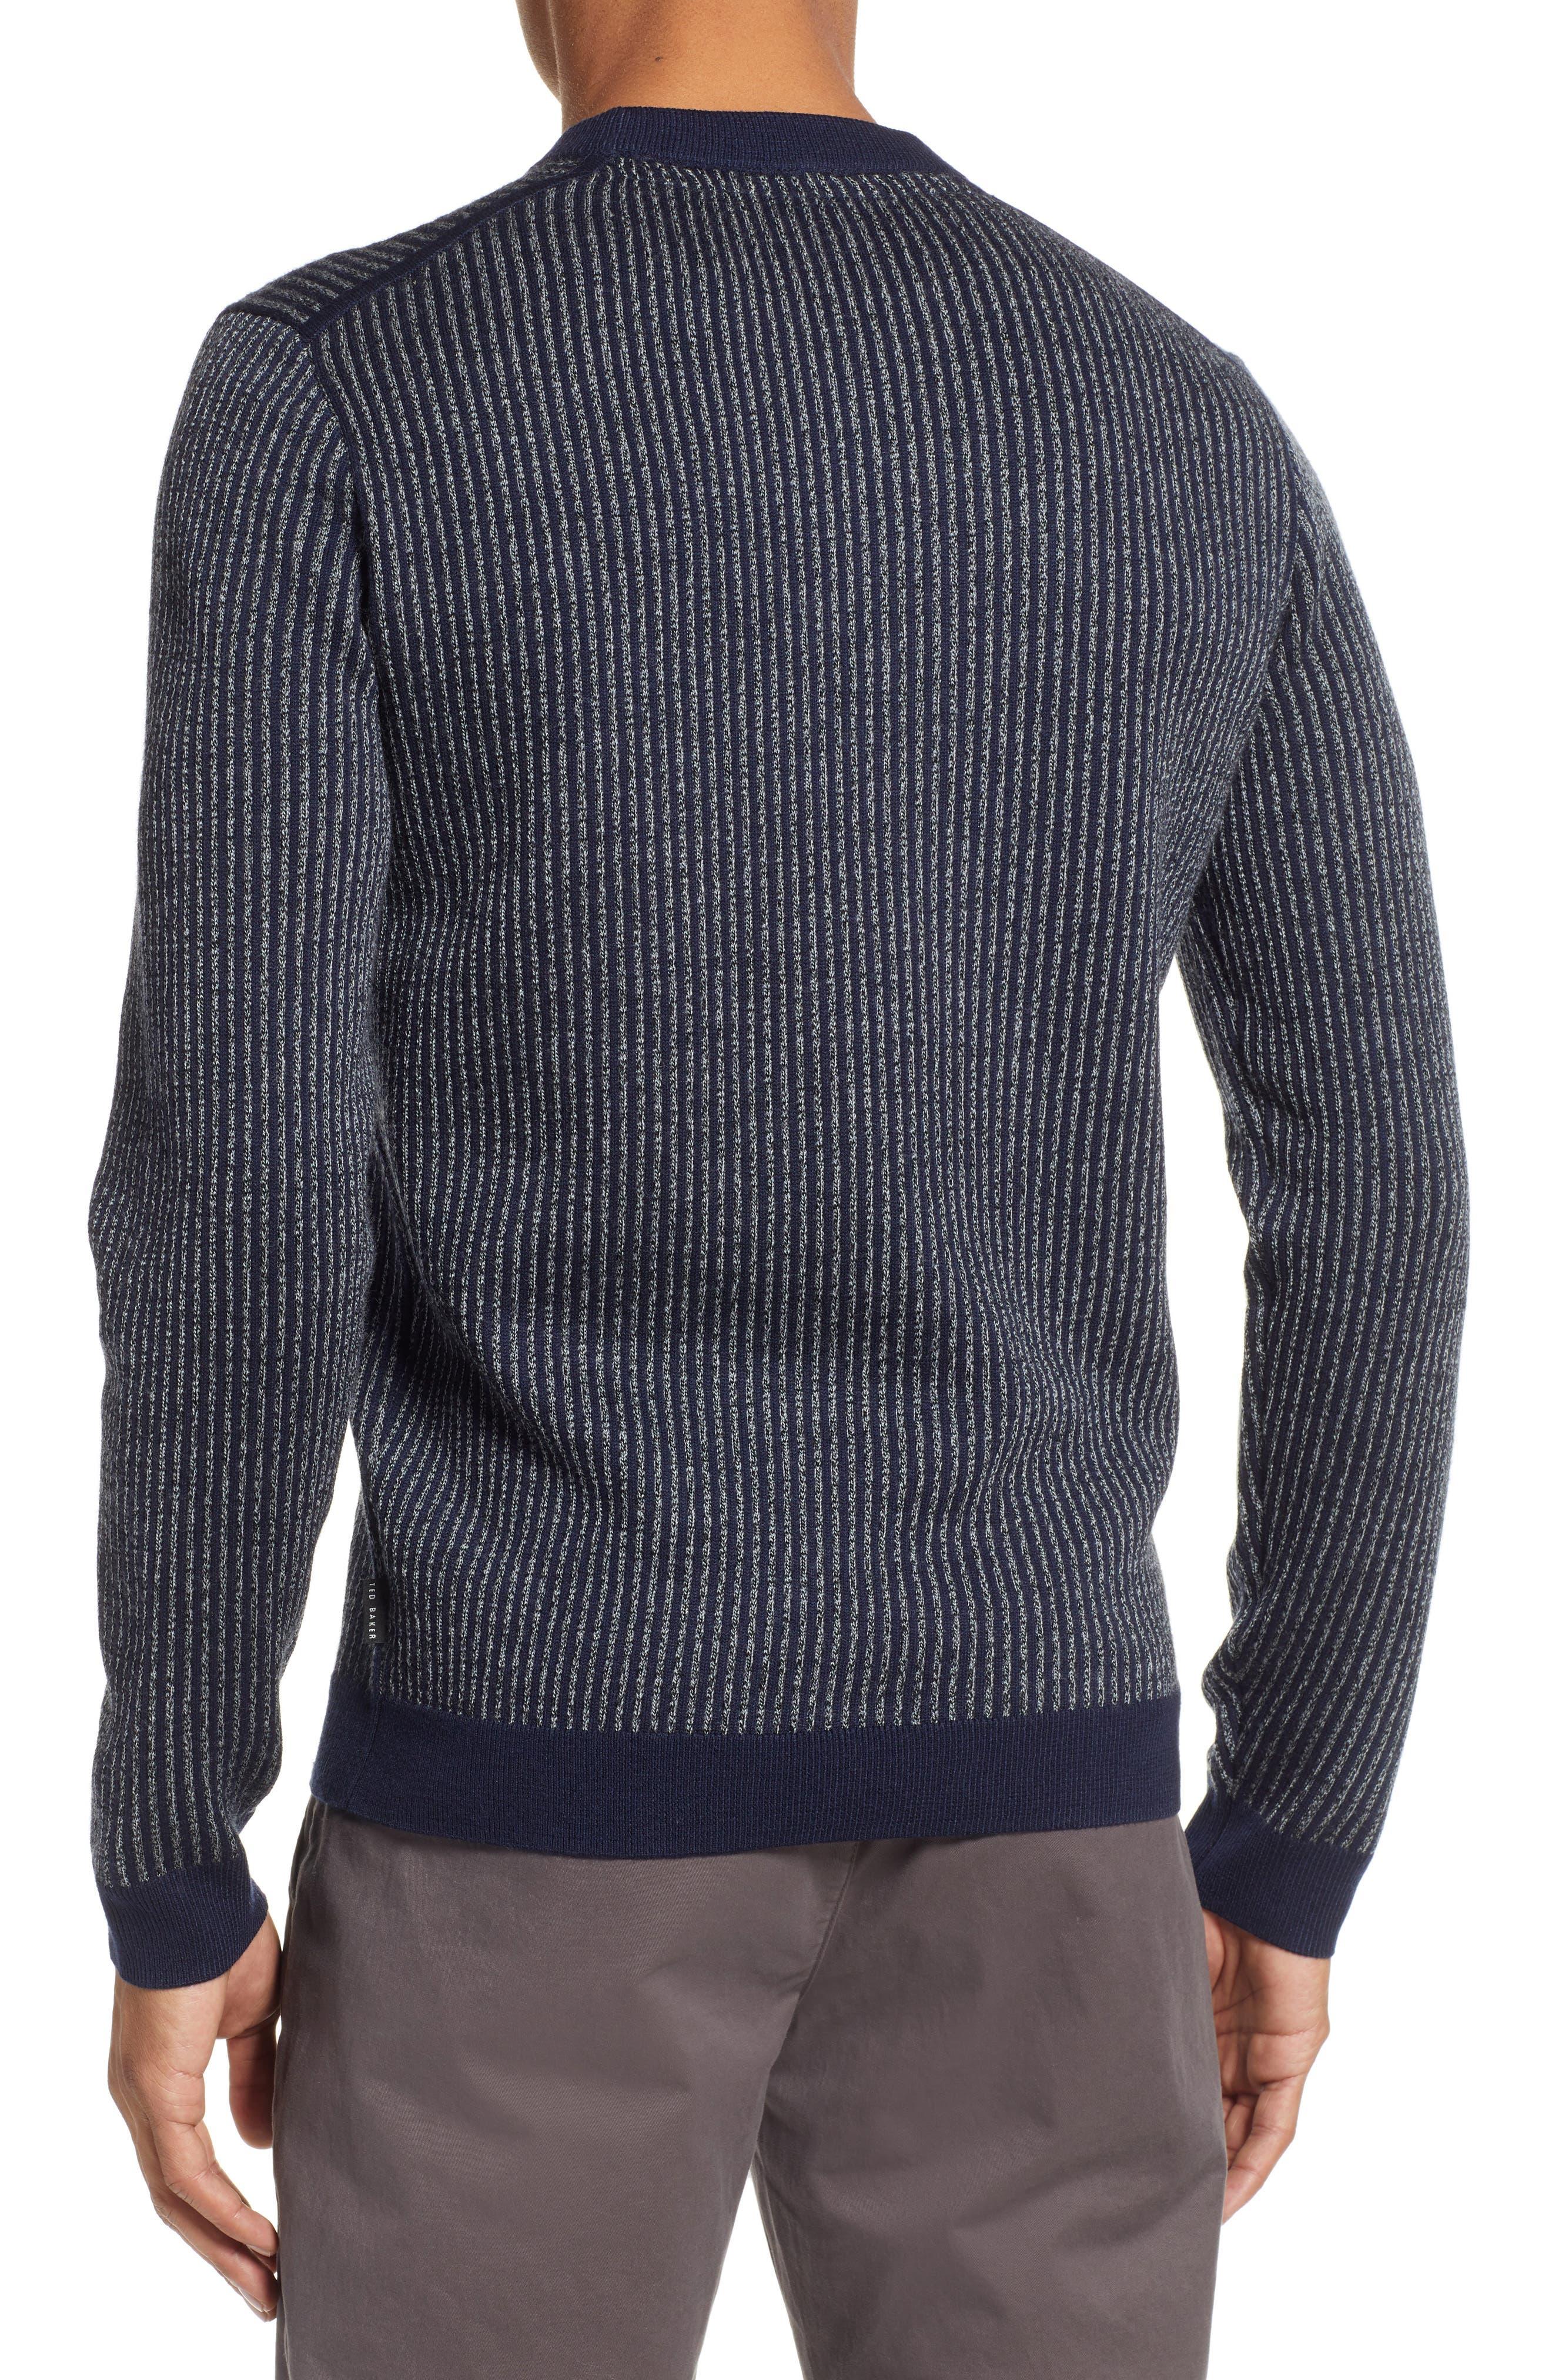 Jinxitt Crewneck Sweater,                             Alternate thumbnail 2, color,                             NAVY